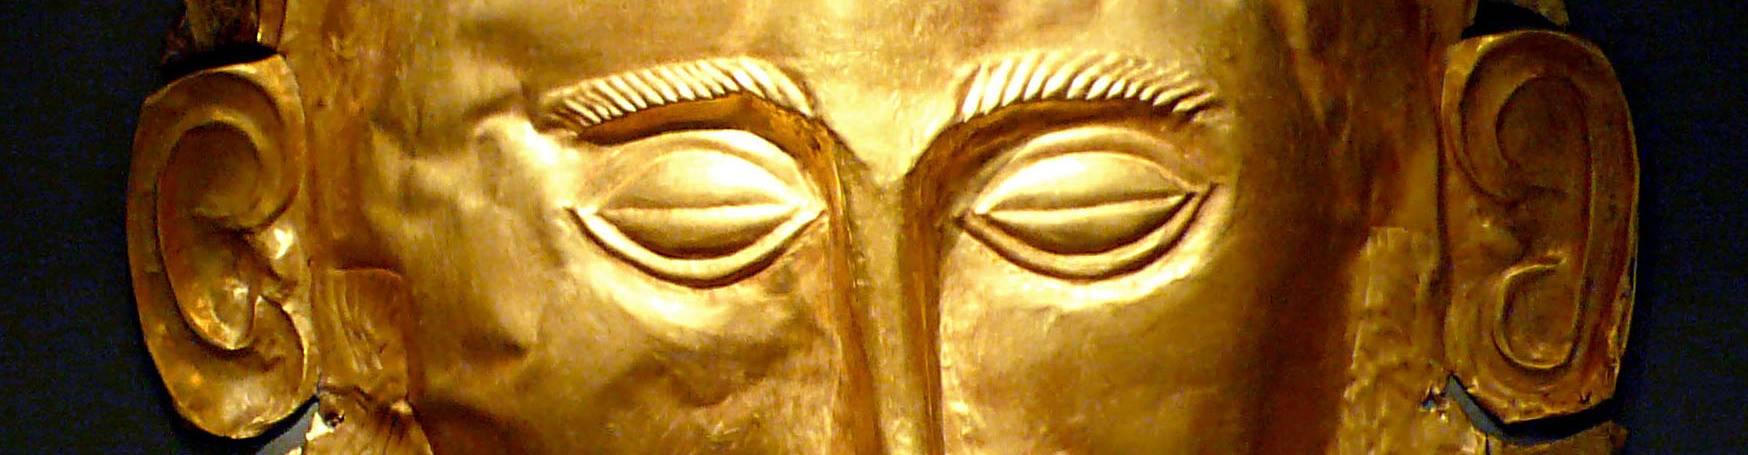 virmuze exhibit Agamemnon Mask logo main banner